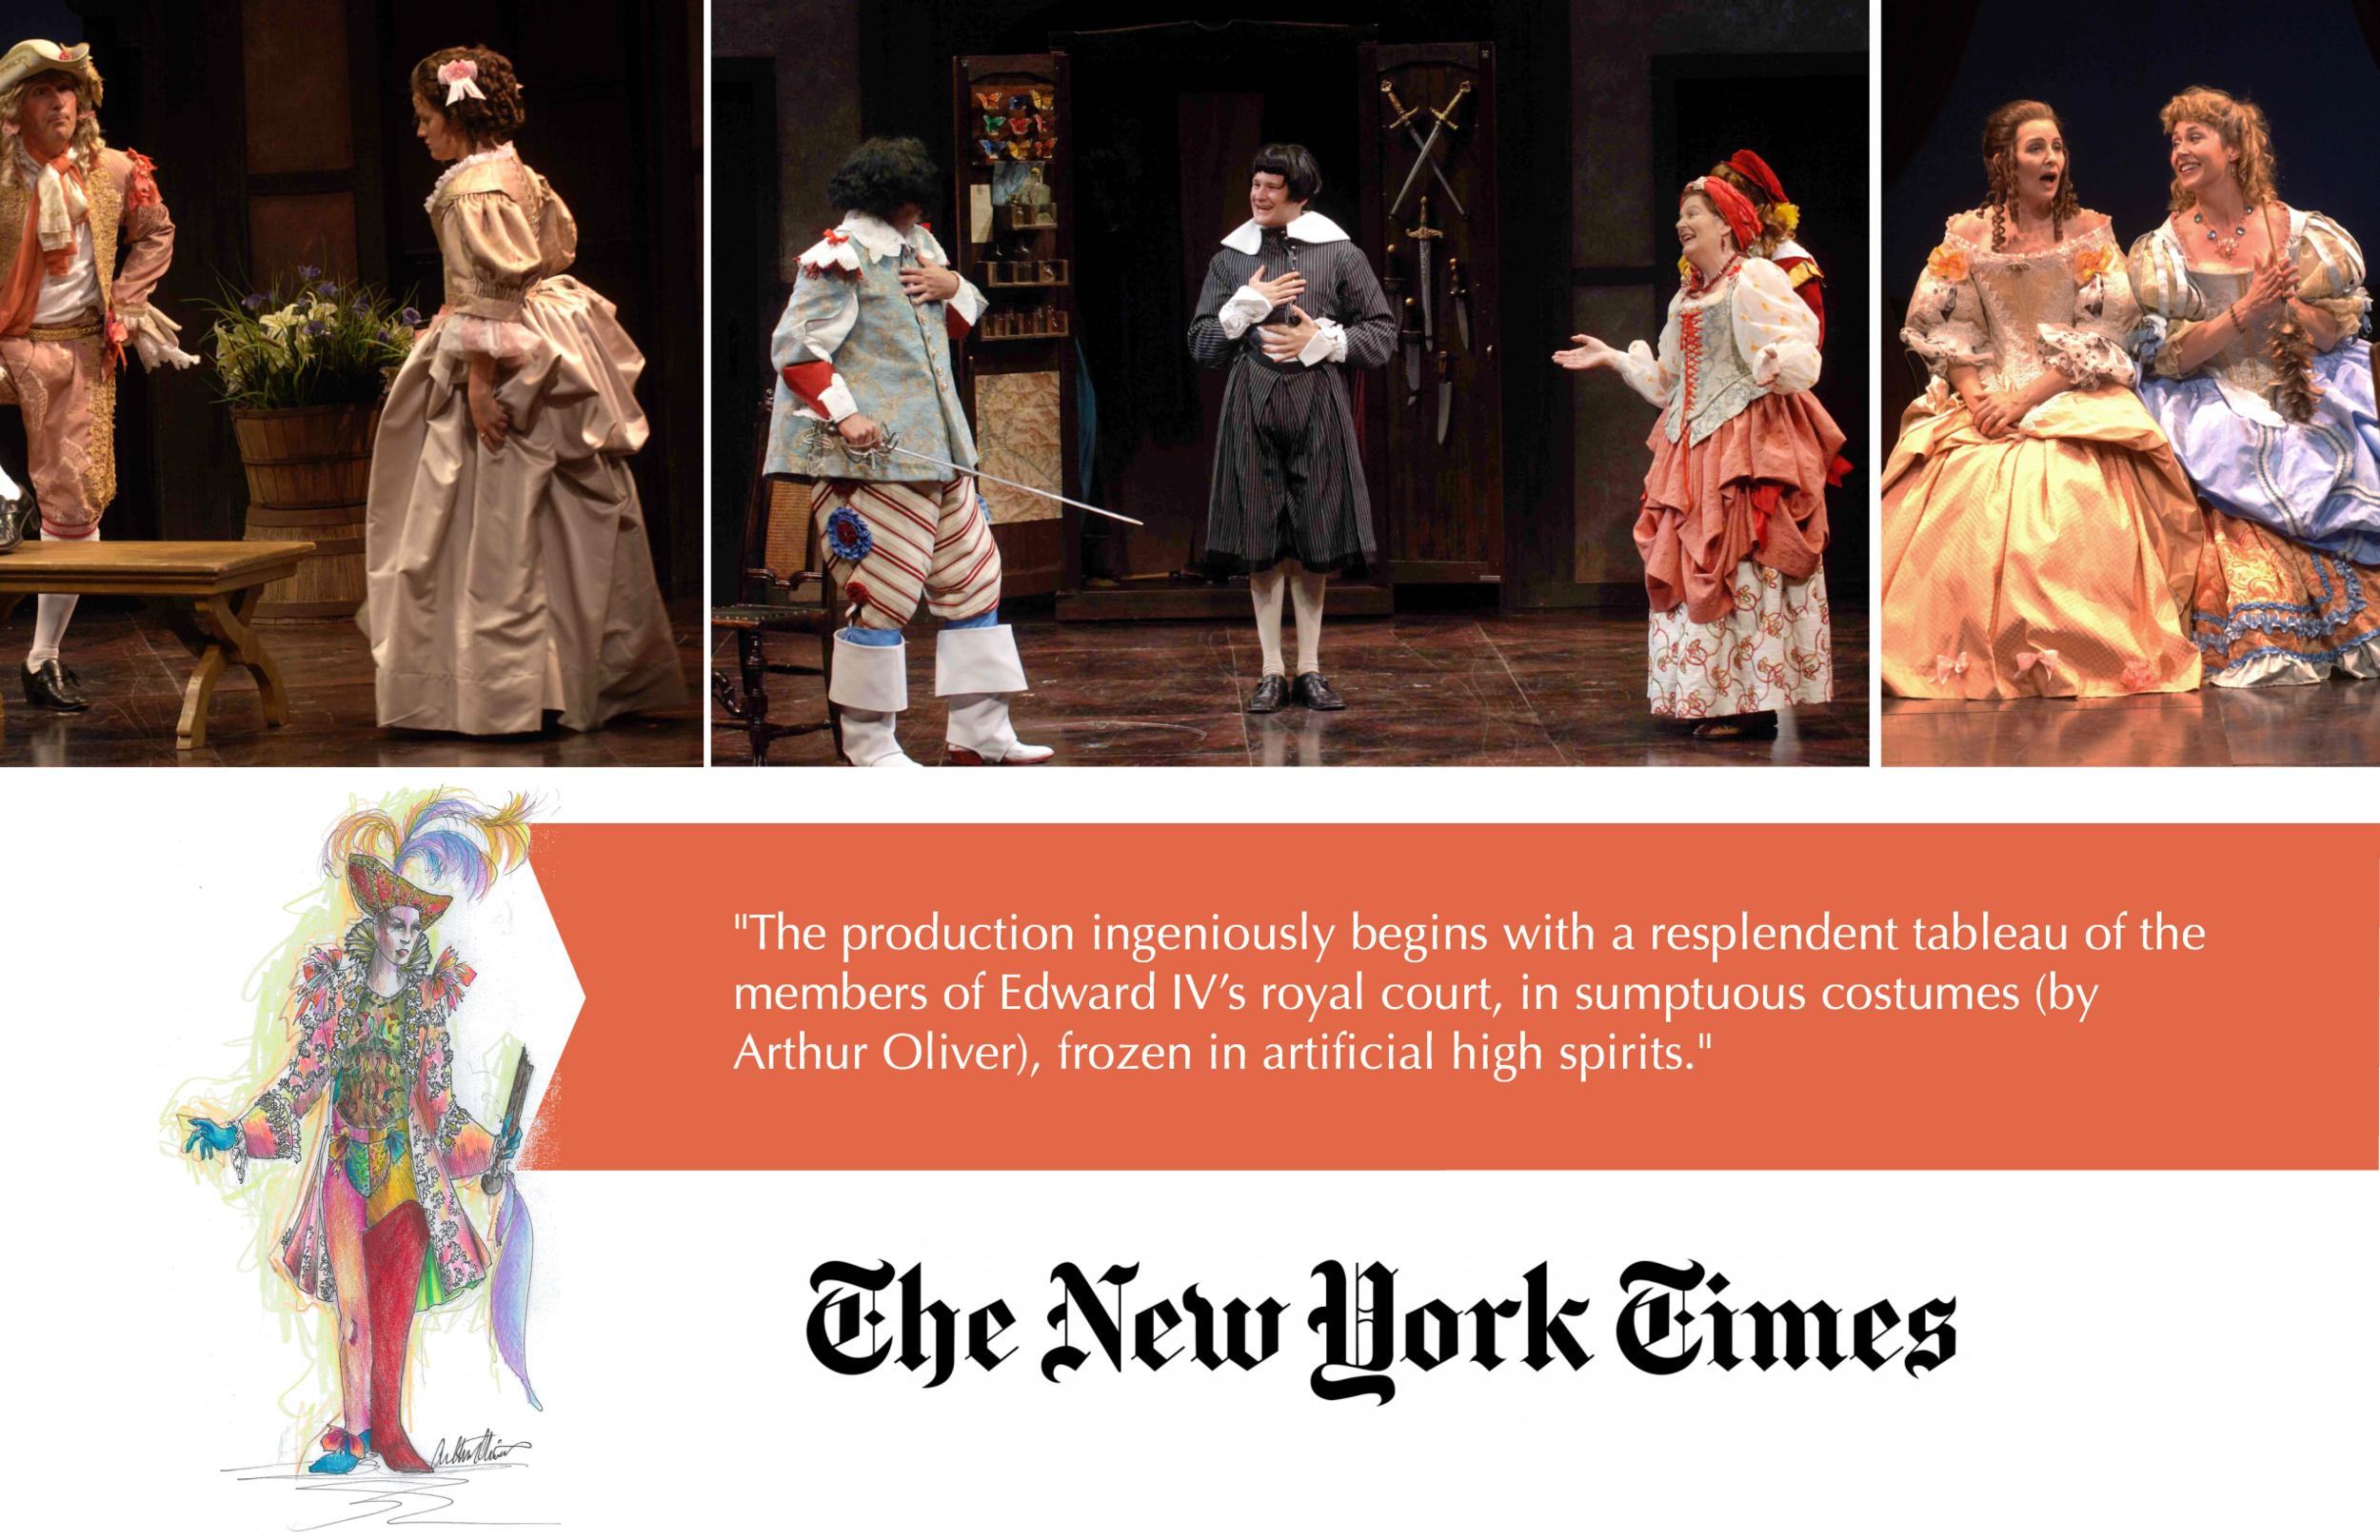 New York Times Costume Designer Arthur Oliver